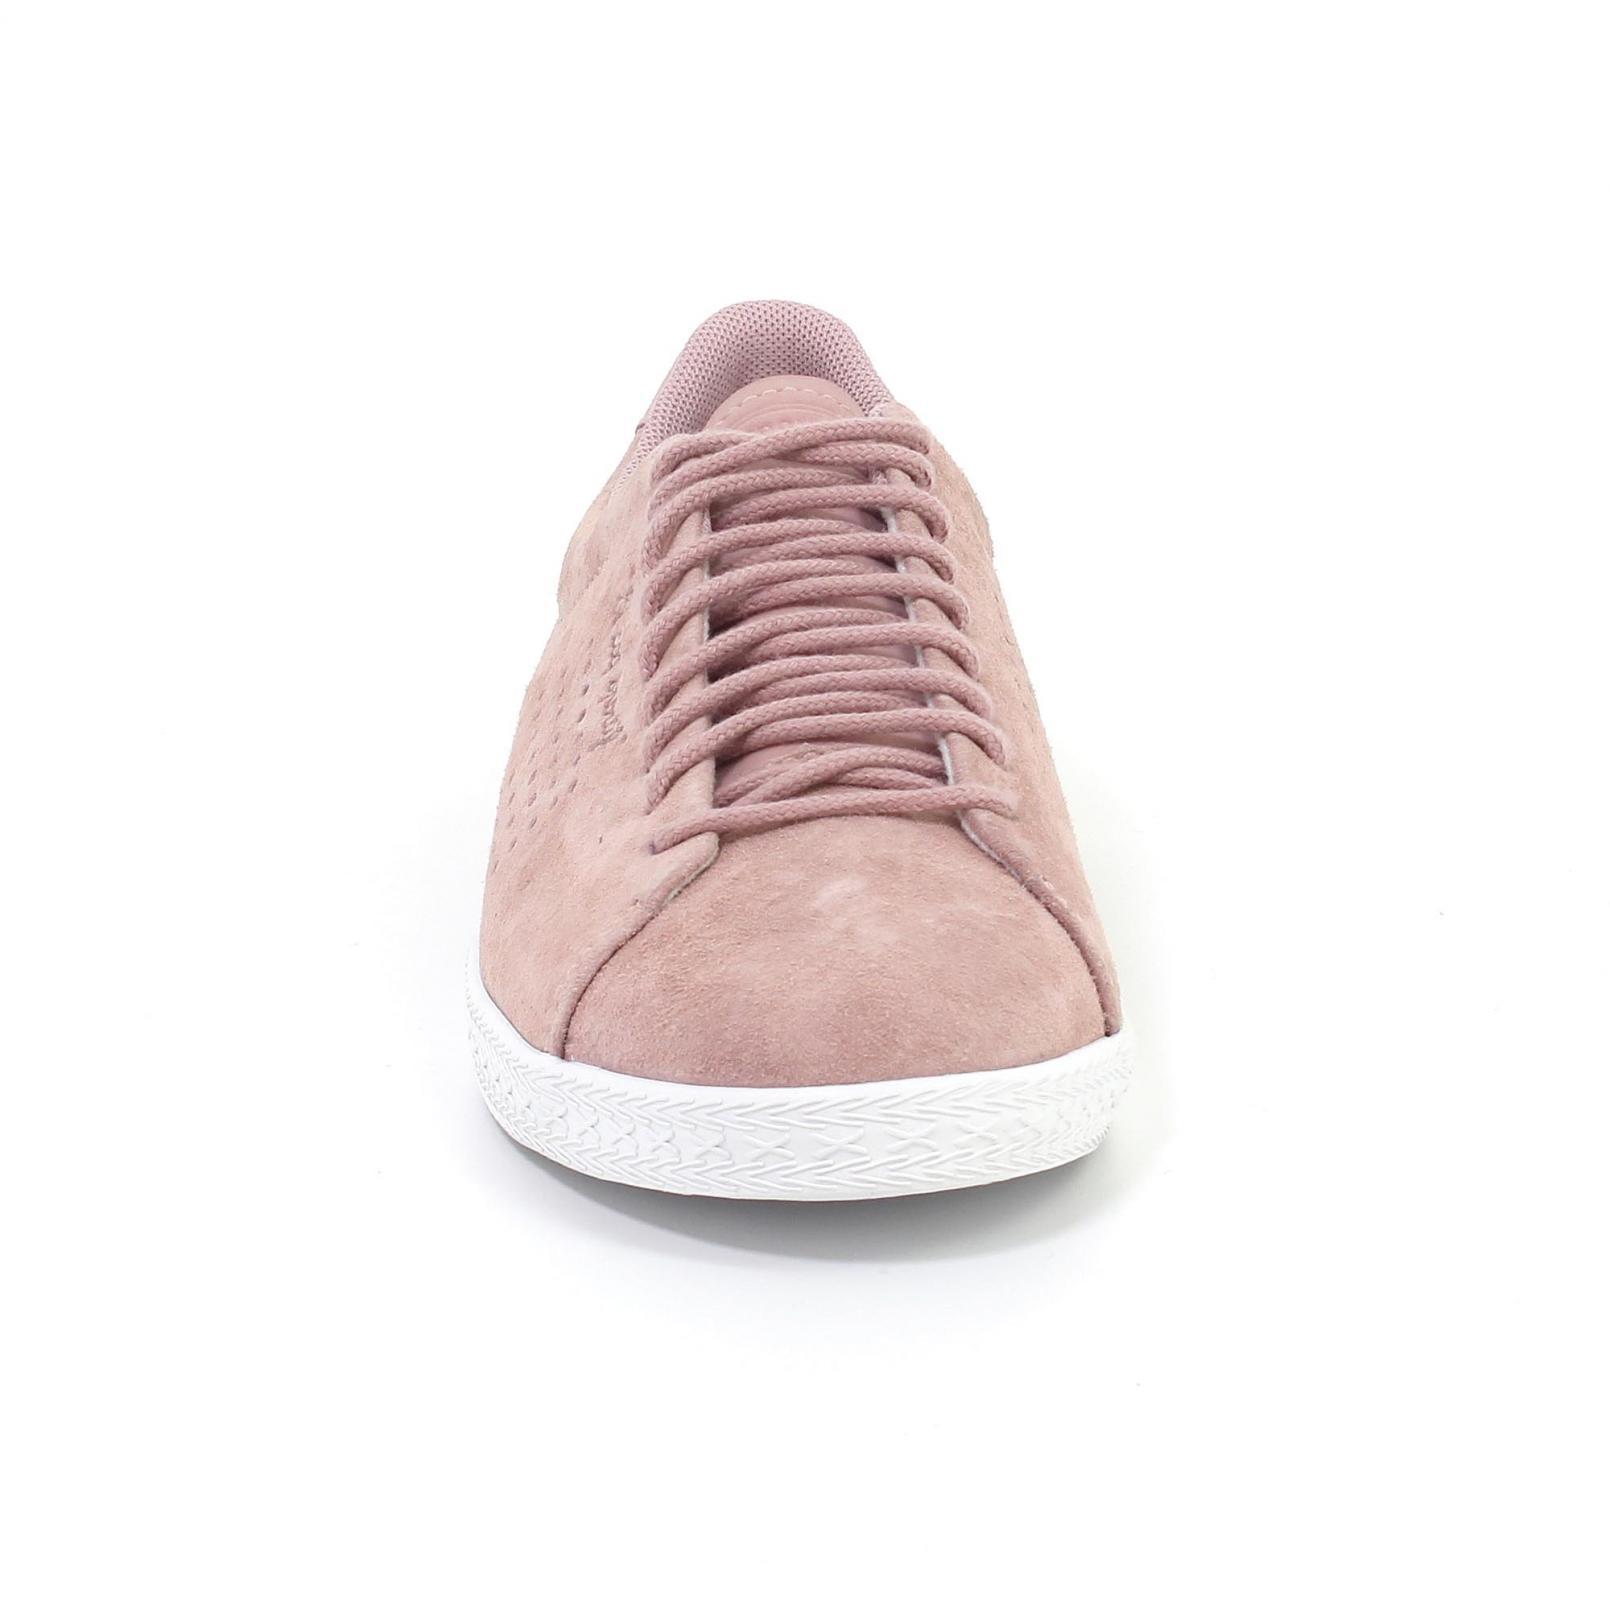 Shoes – Le Coq Sportif Charline Nubuck Pink/Pink